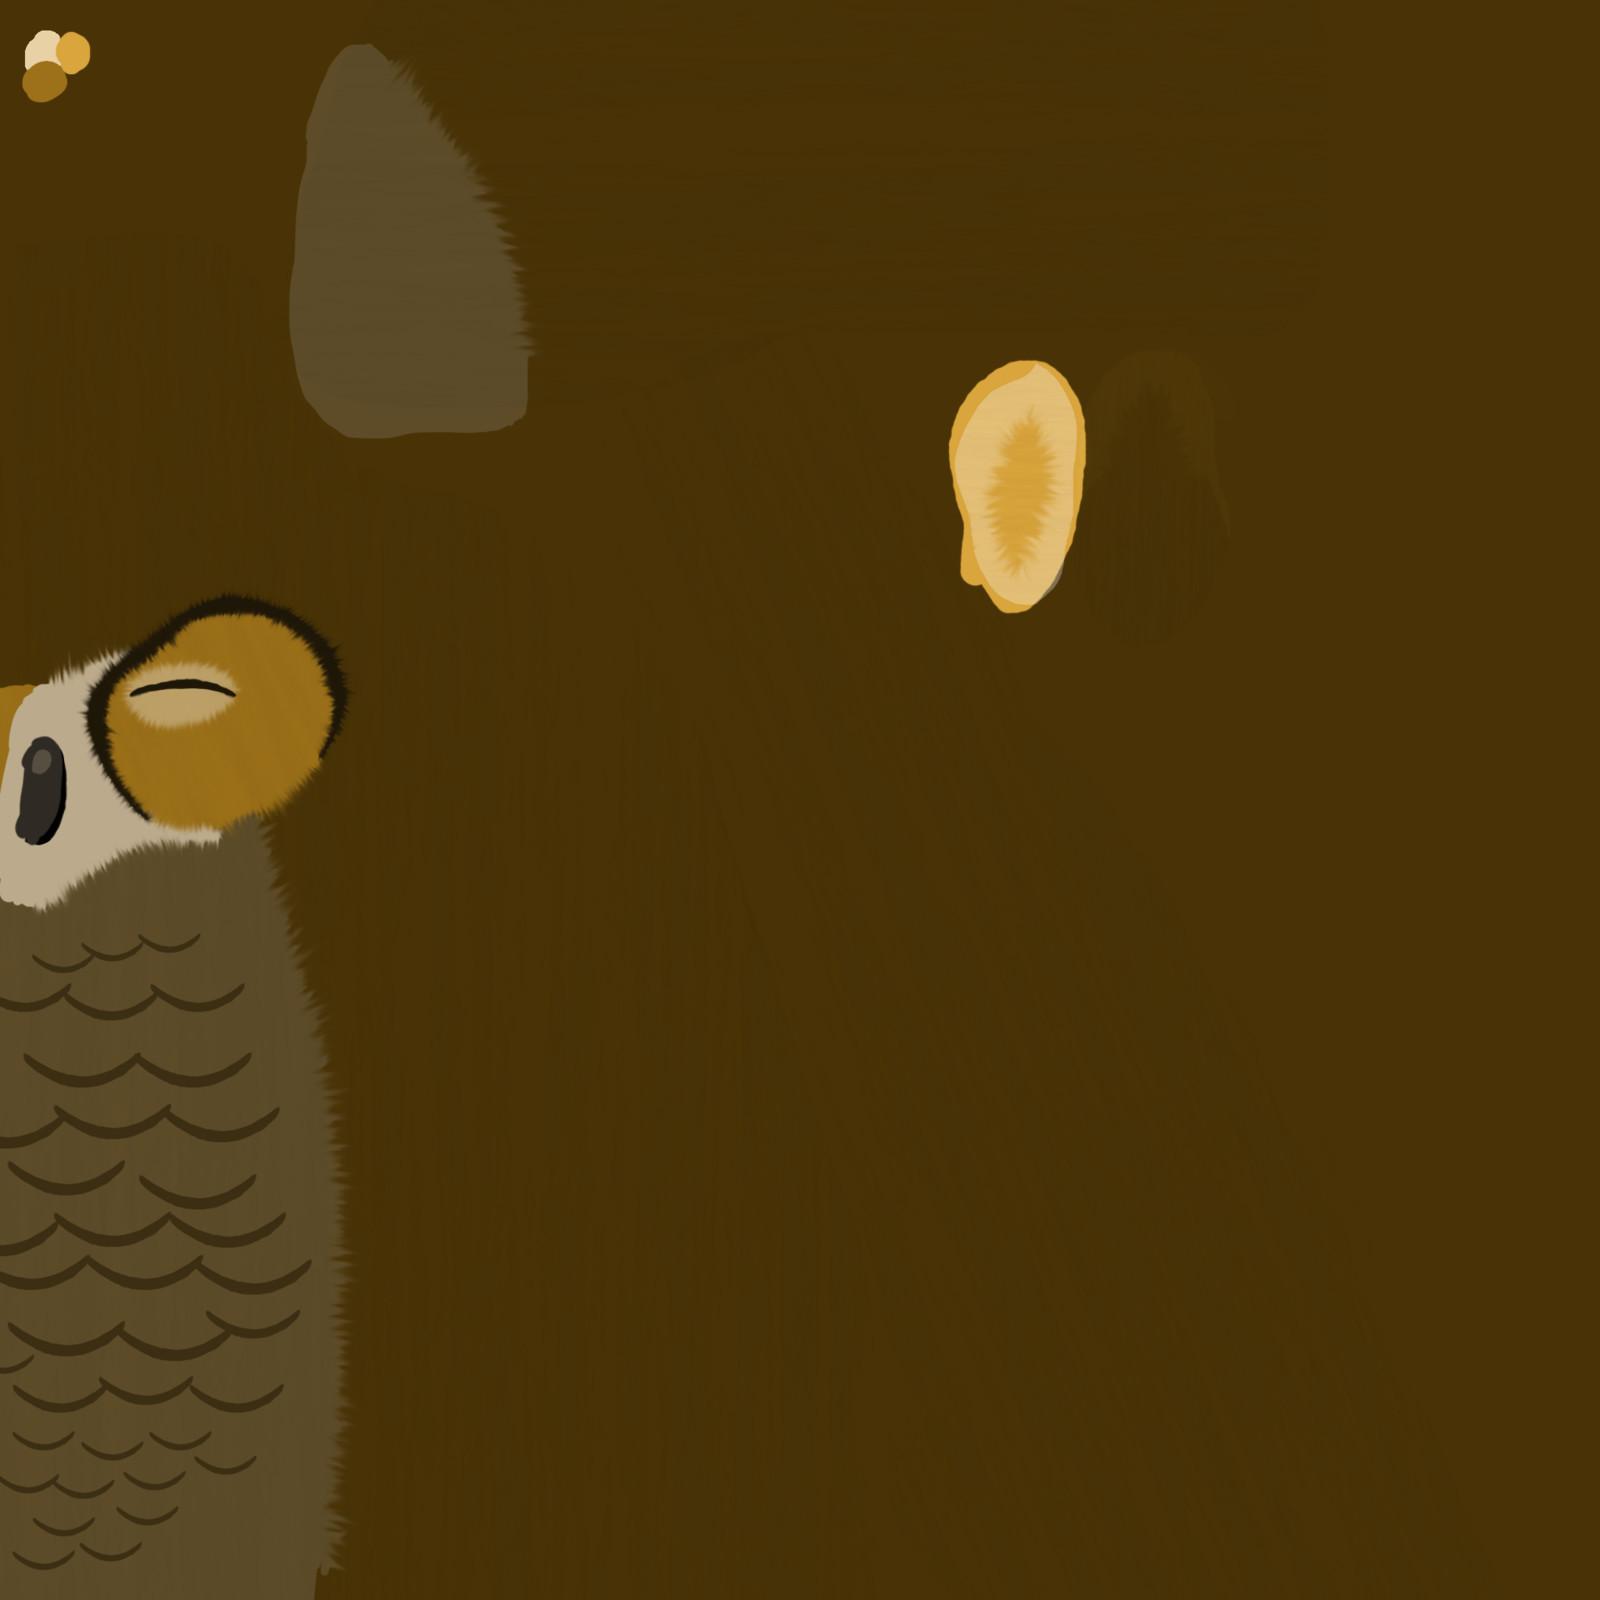 Owl texture